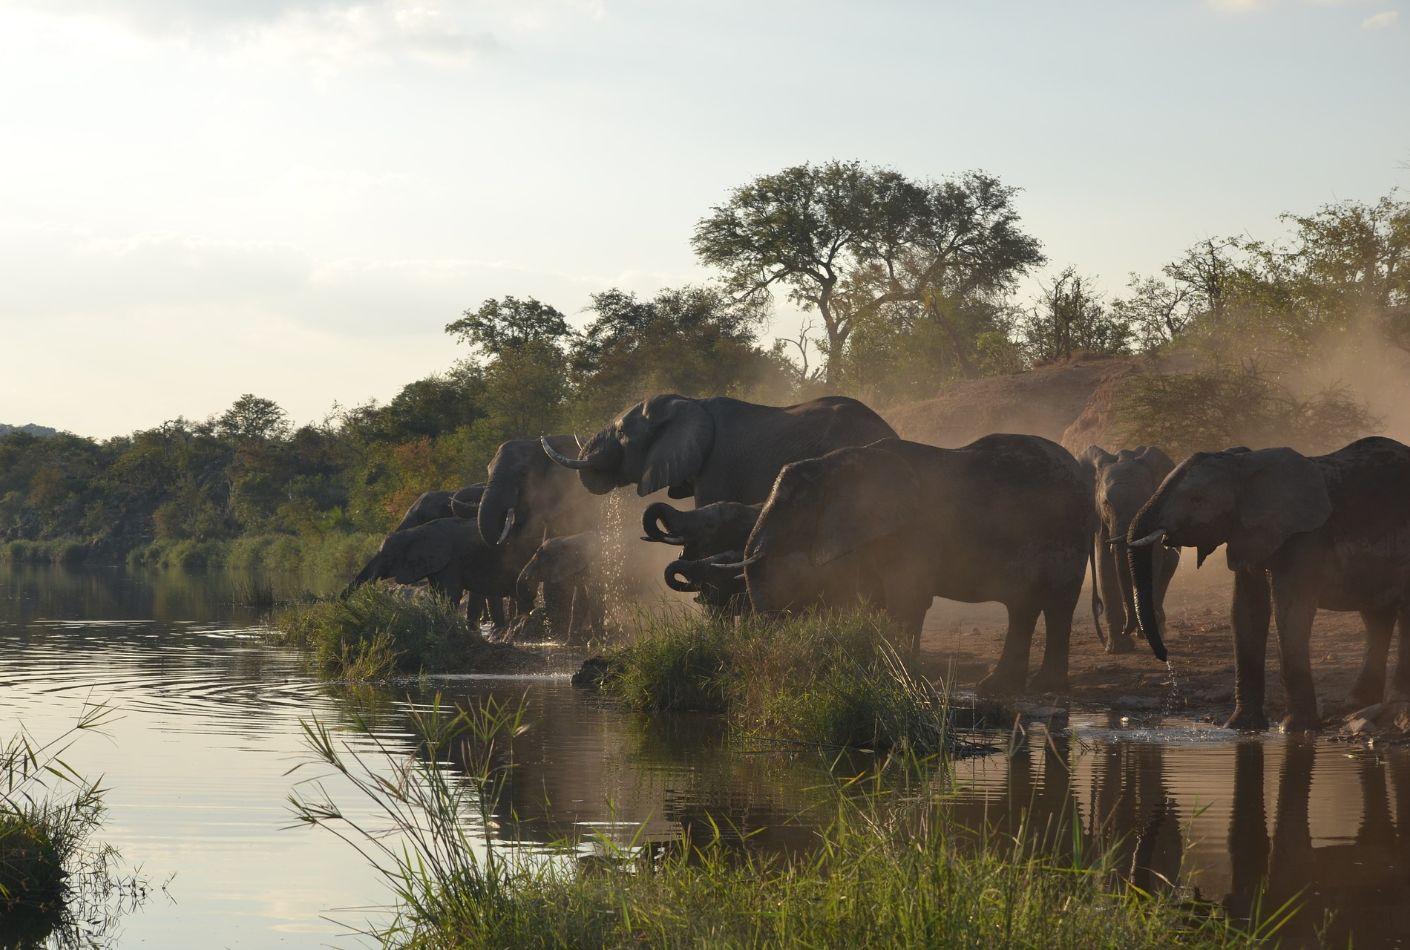 Elefantes en el Parque Kruger. Gran oferta en el parque Kruger.